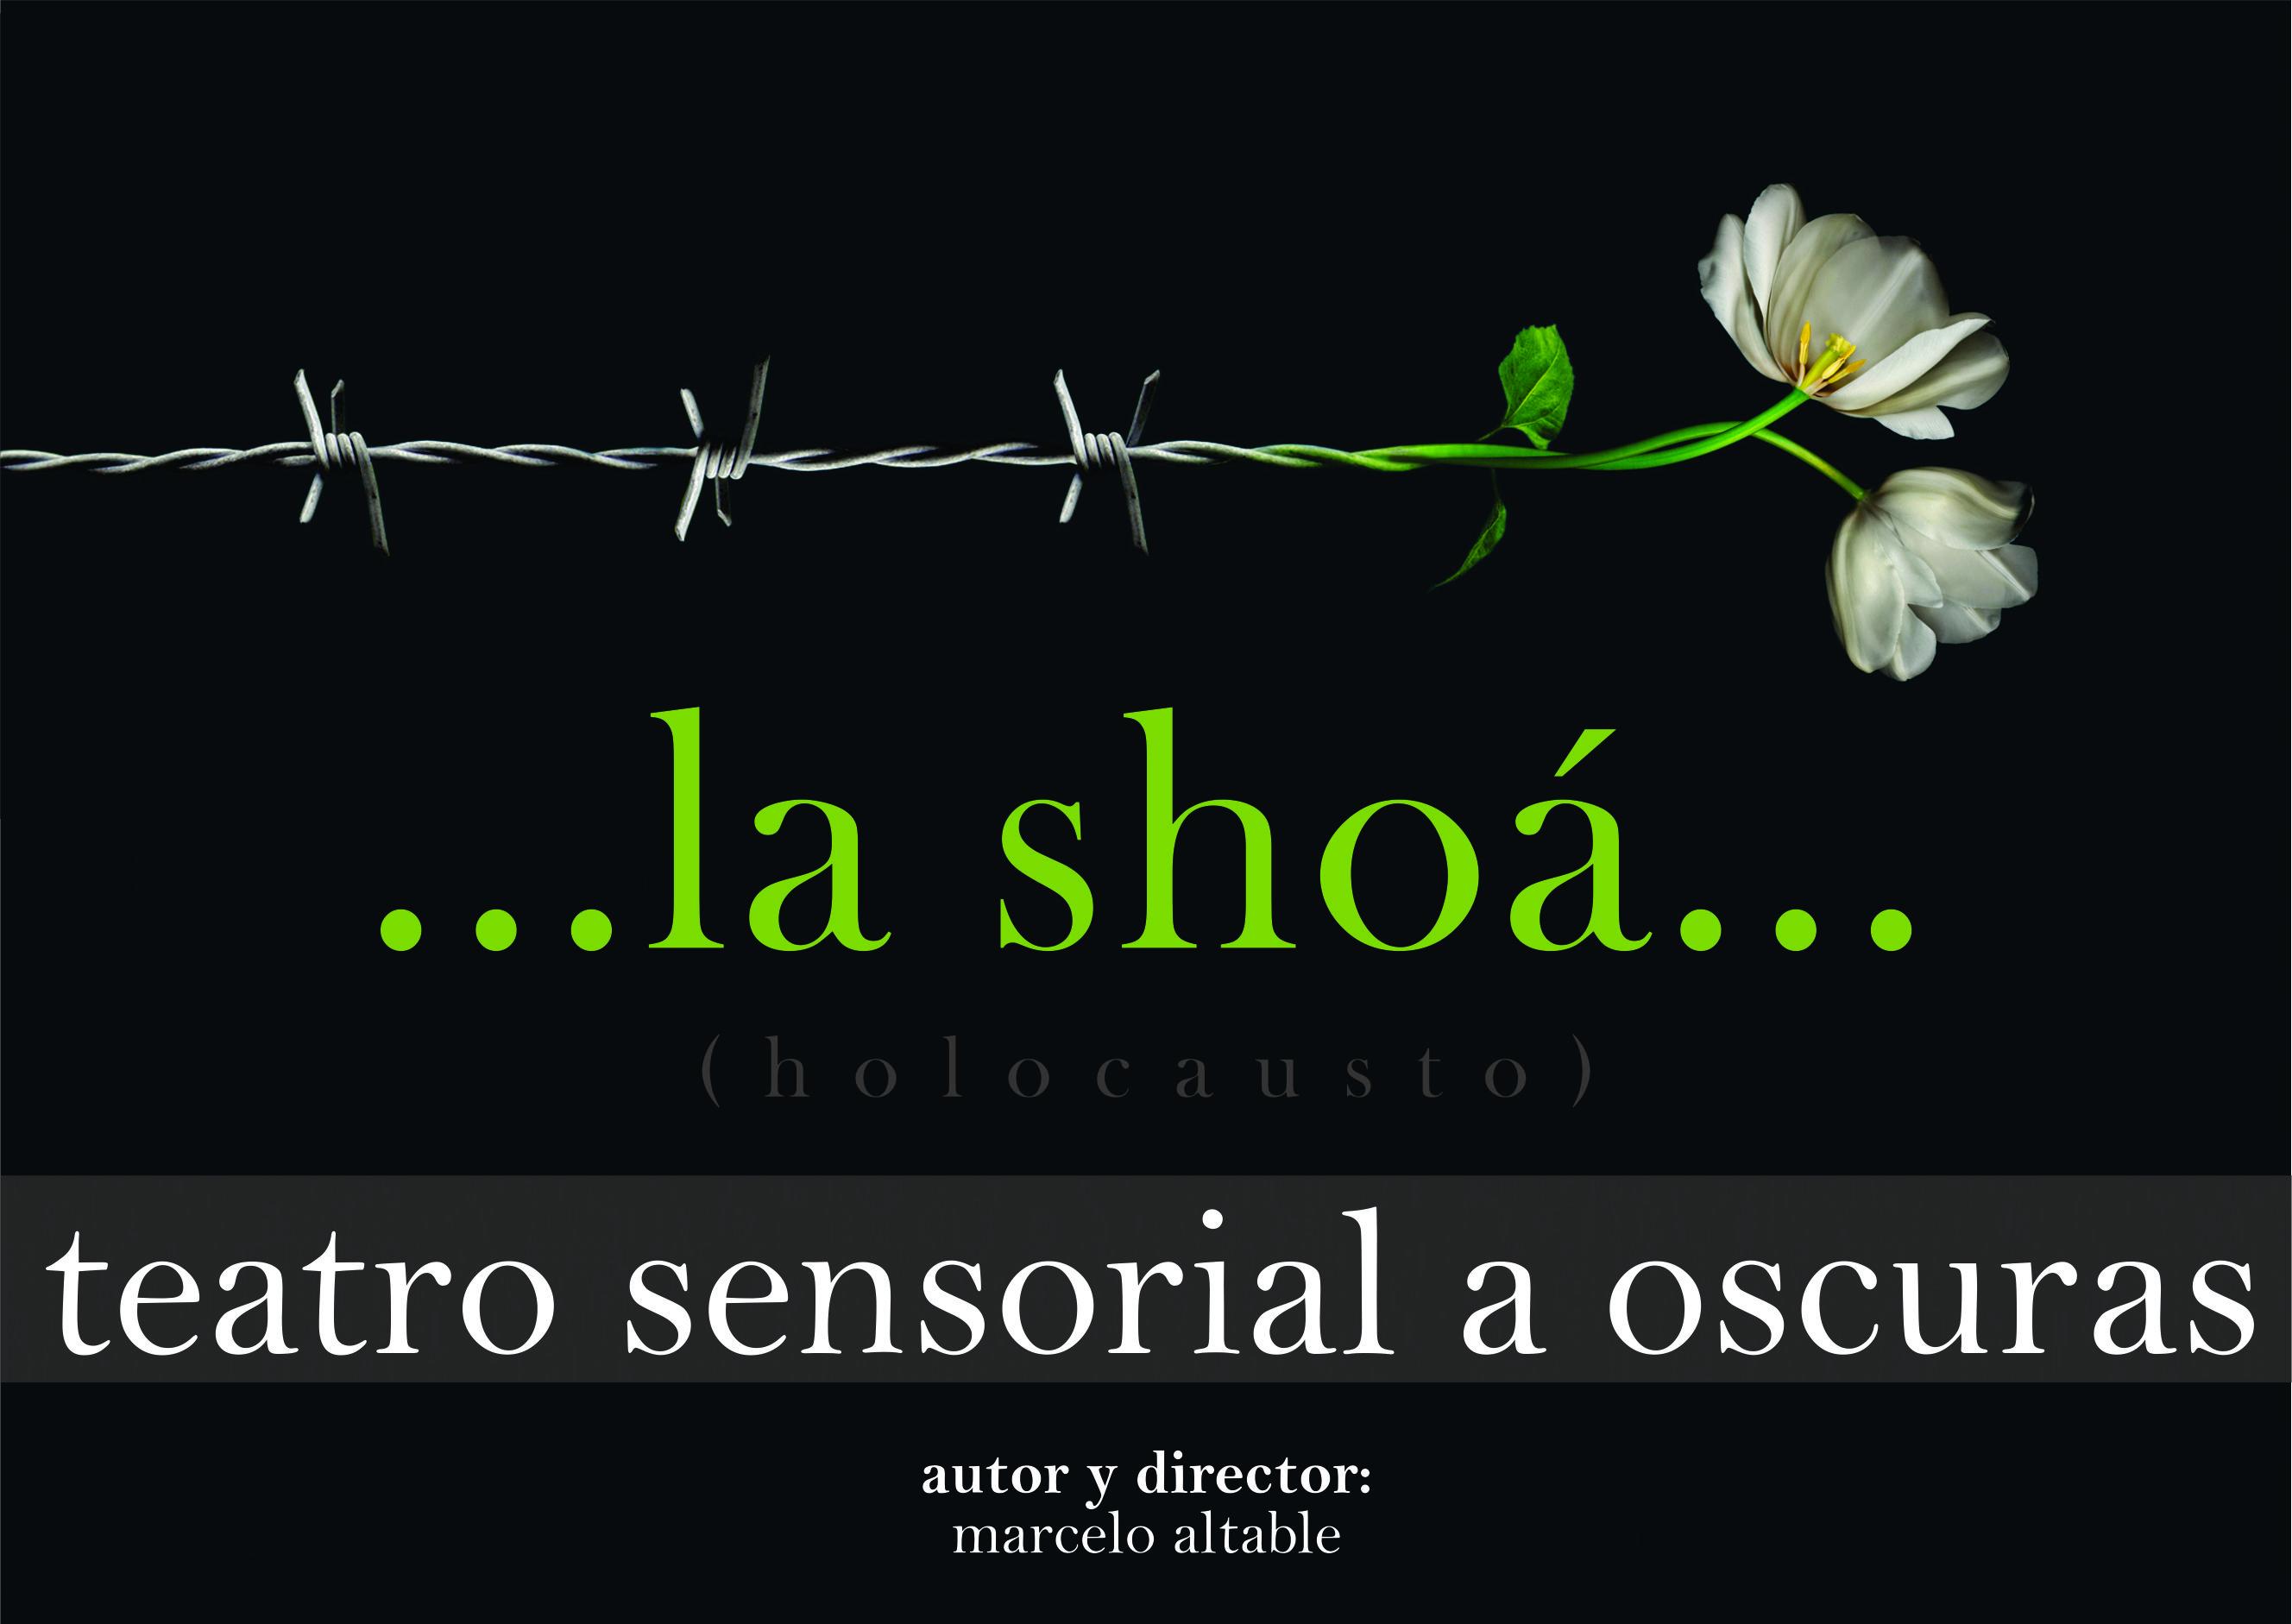 """La Shoa (Holocausto)"": teatro sensorial a oscuras"